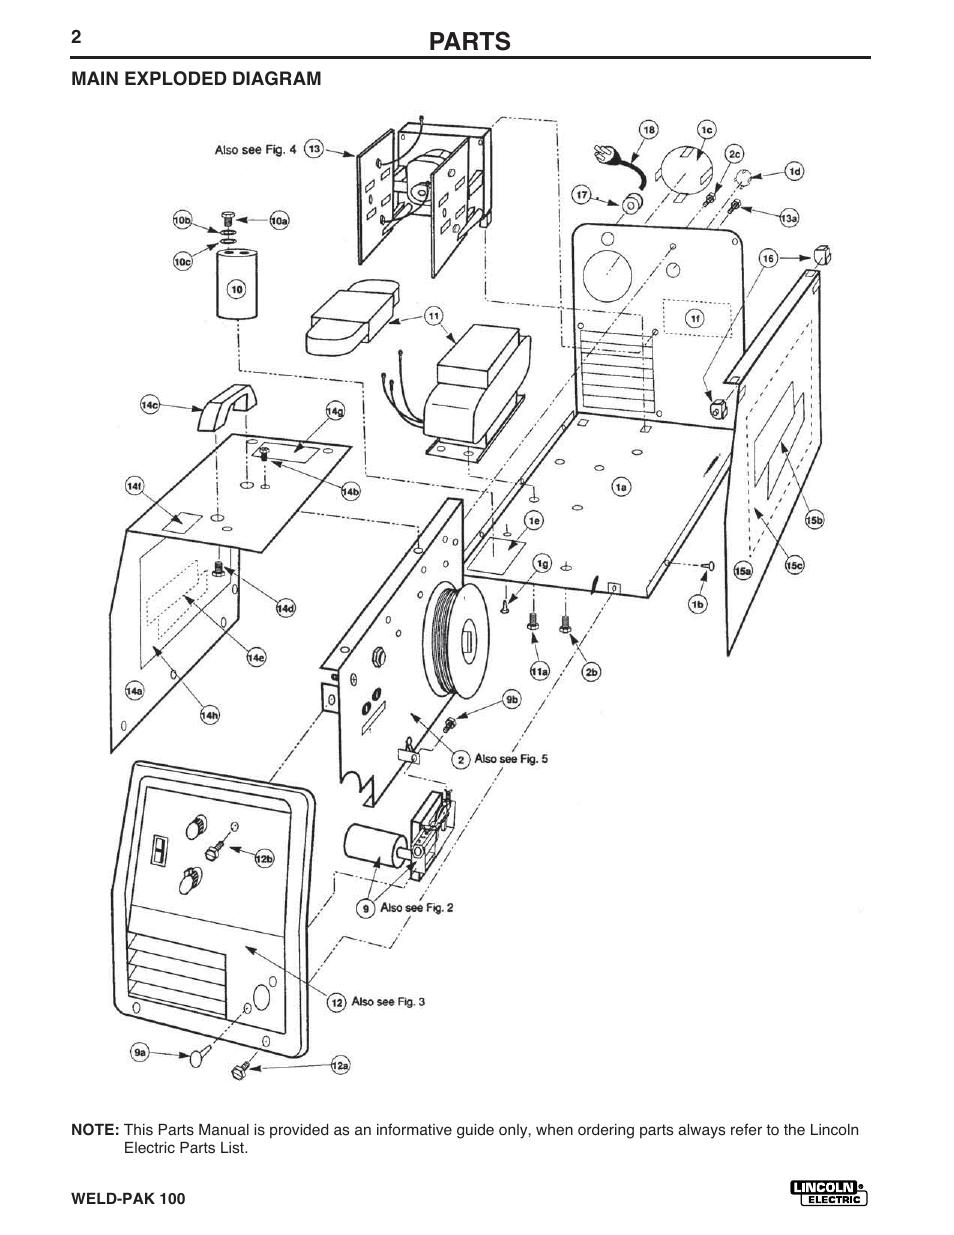 Lincoln Weld Pak 100 Parts Diagram